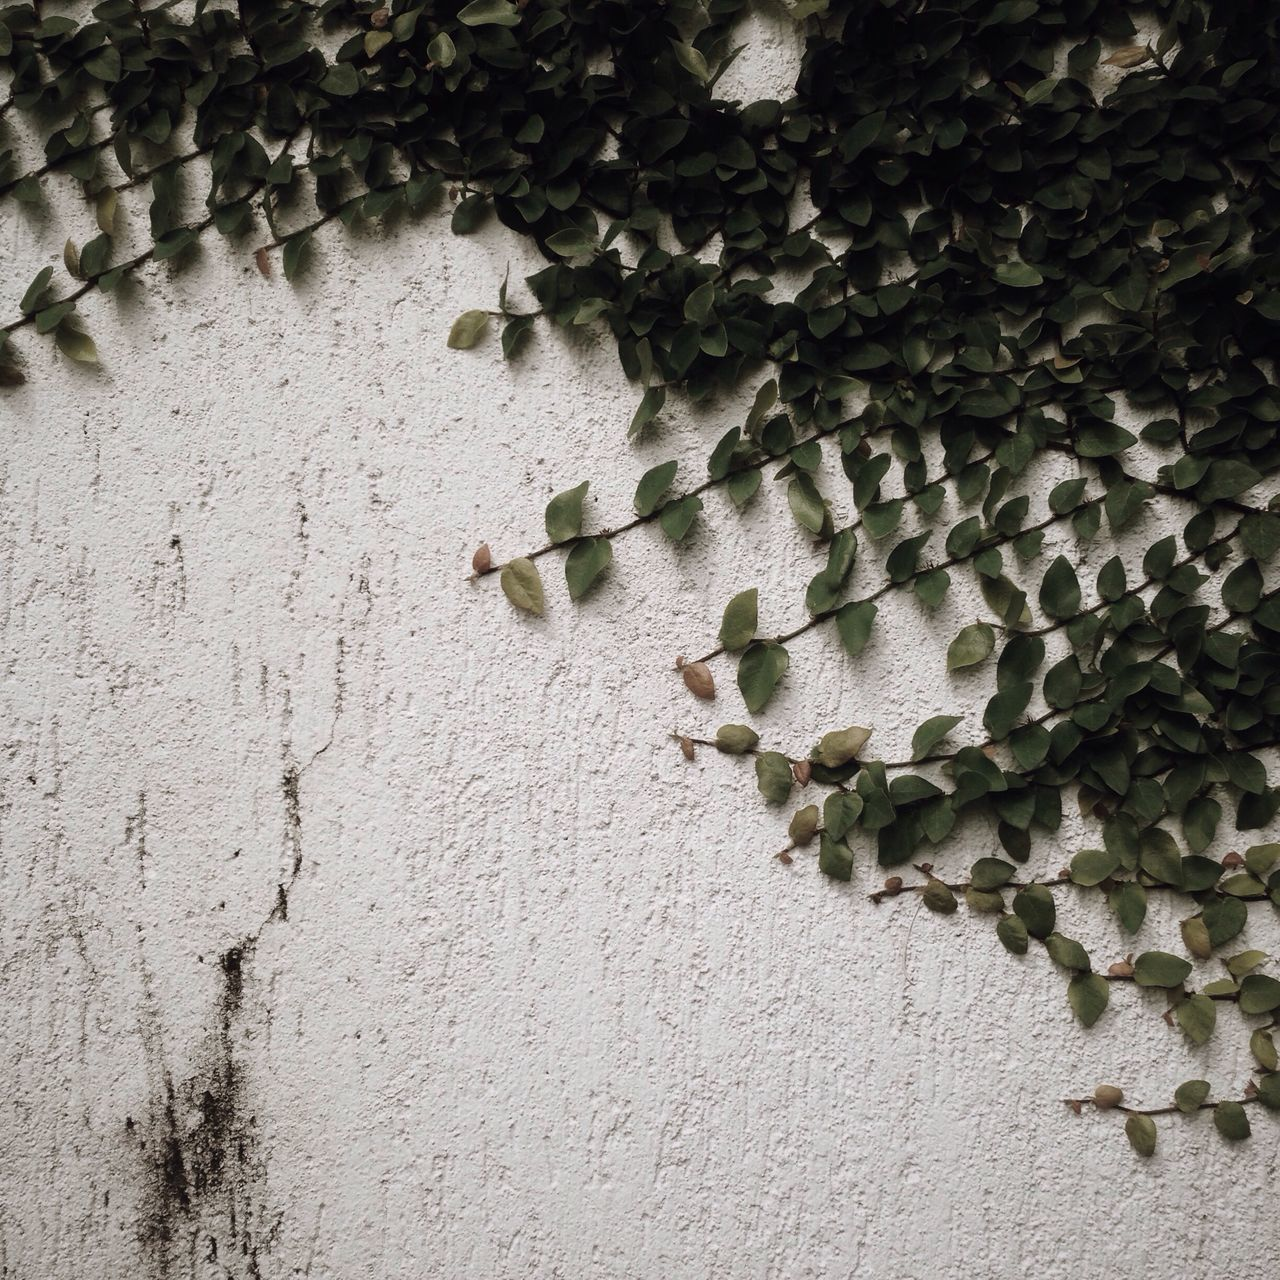 Creeper On Textured Wall